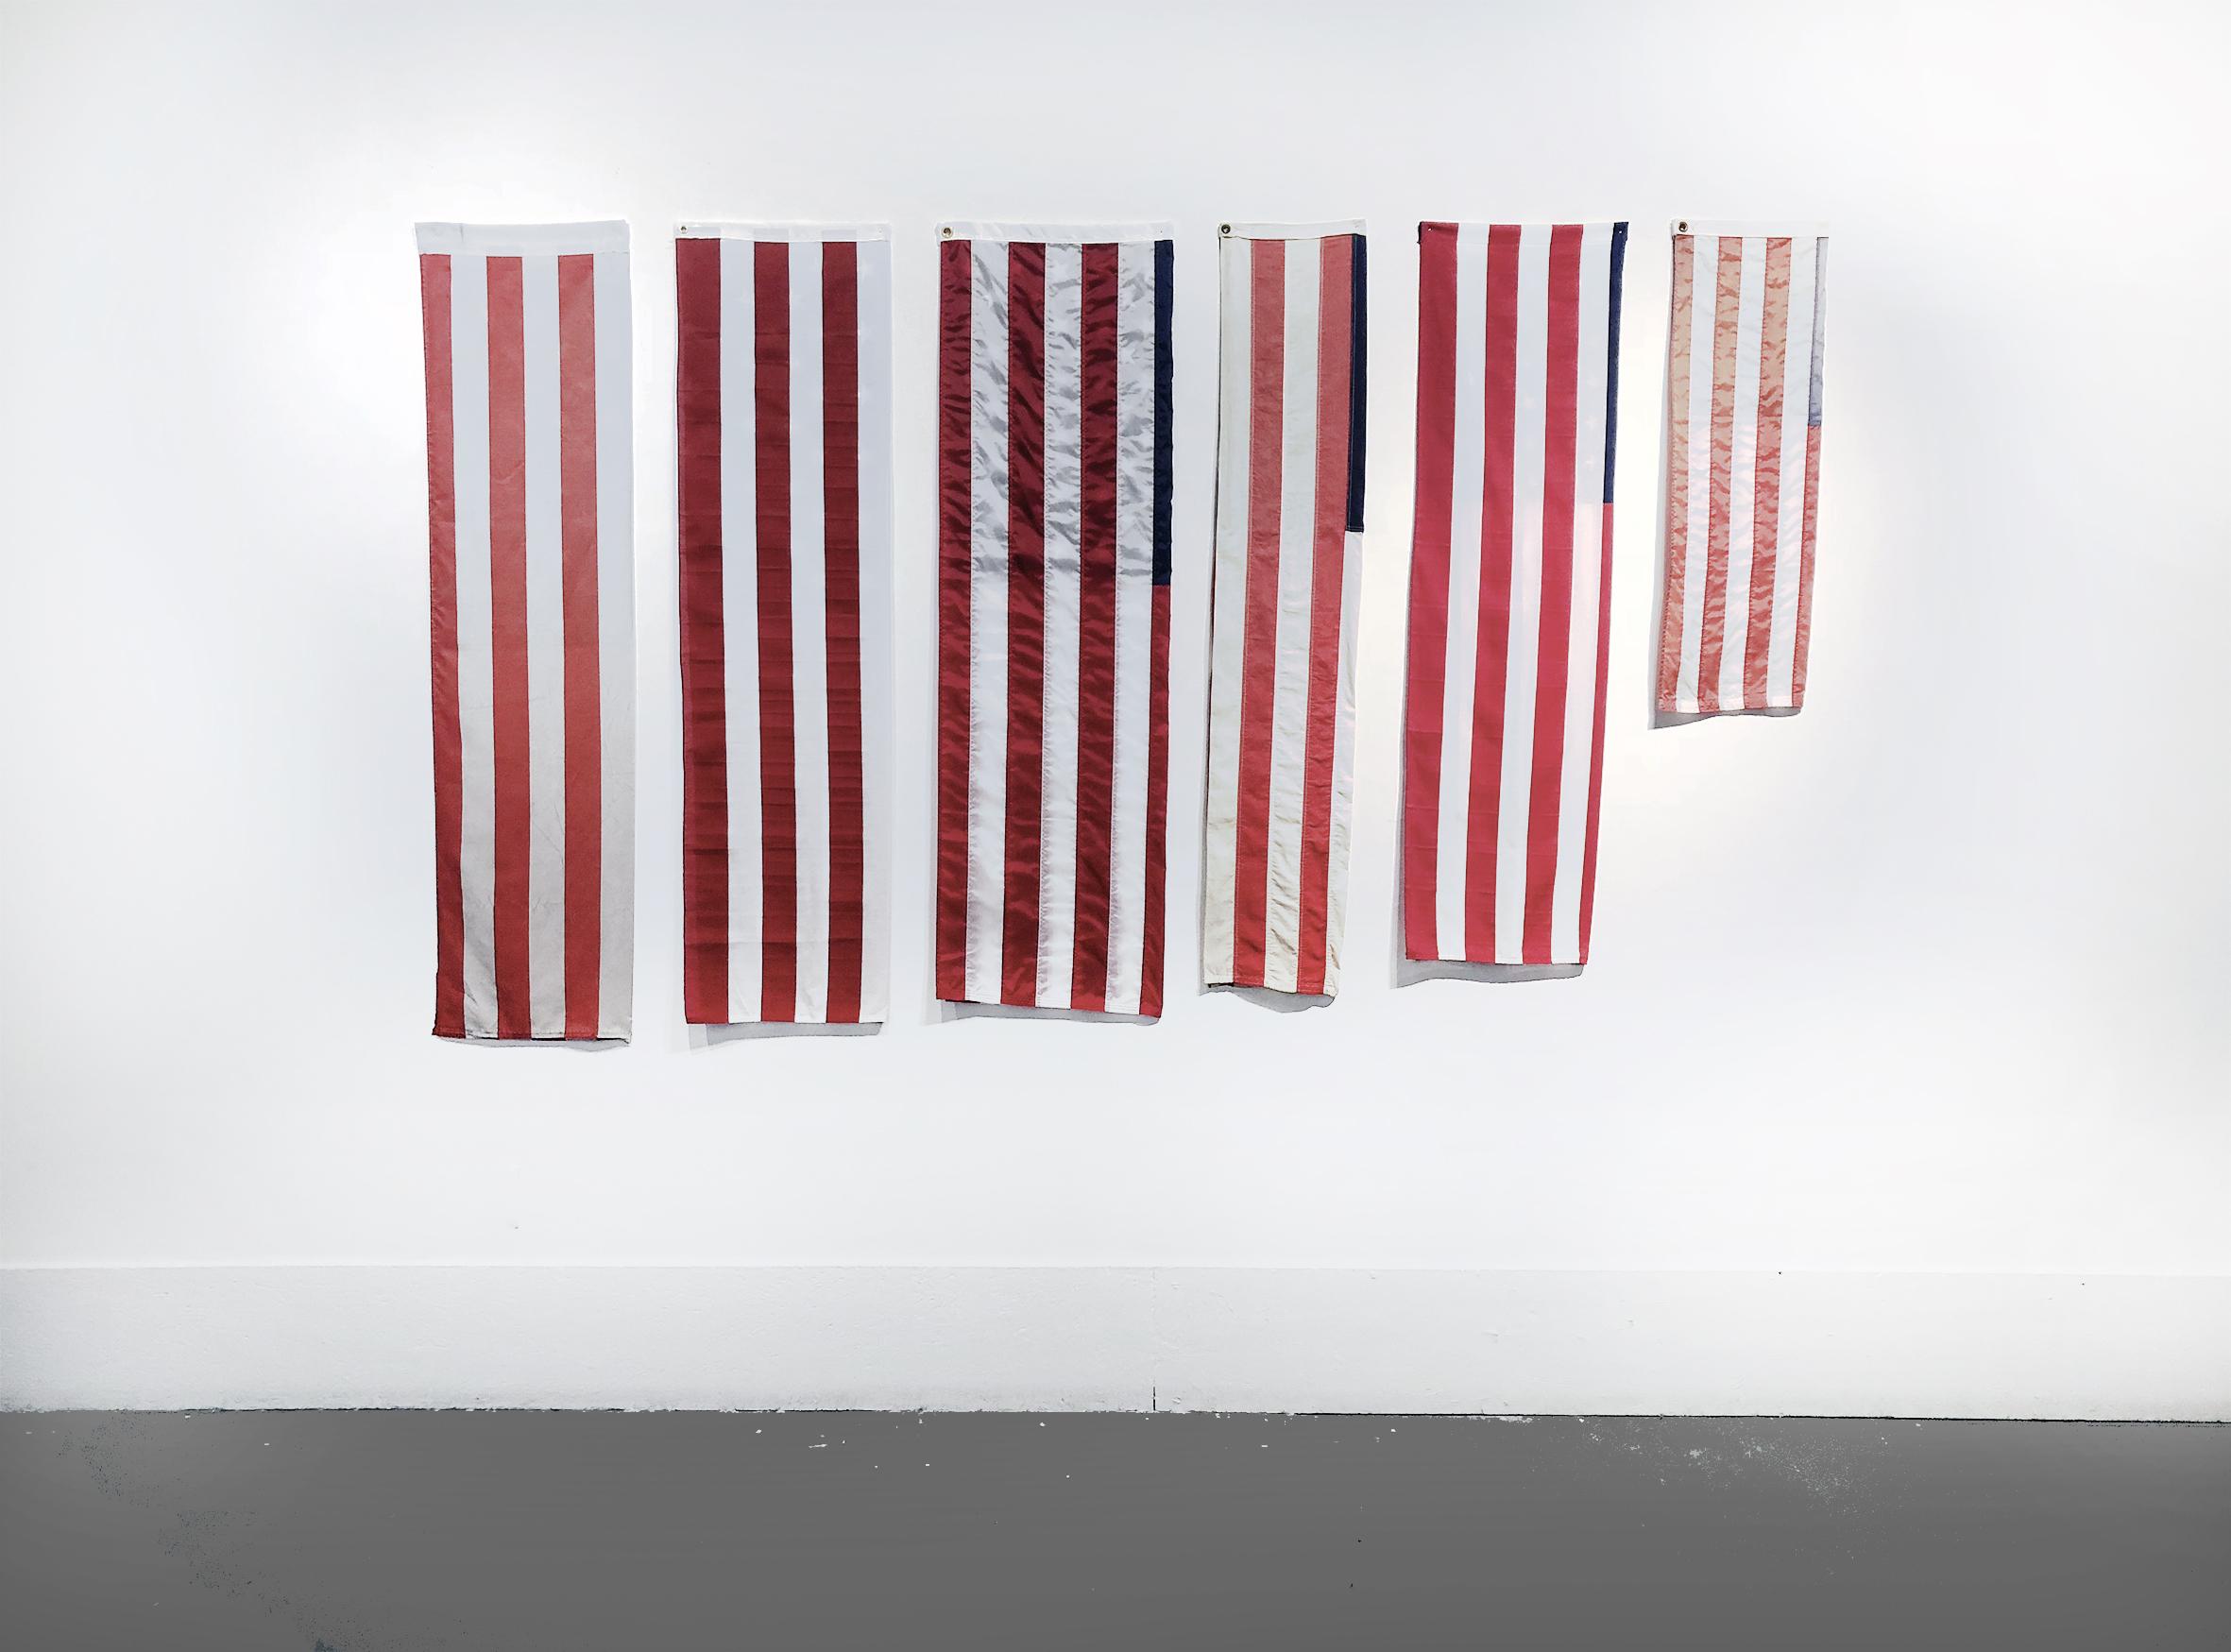 Mano Penalva , Desvio Vermelho e Branco, 2018, 158 x 265 cm Foto: Camila Crivelenti (Hasta Tepito/ NY)